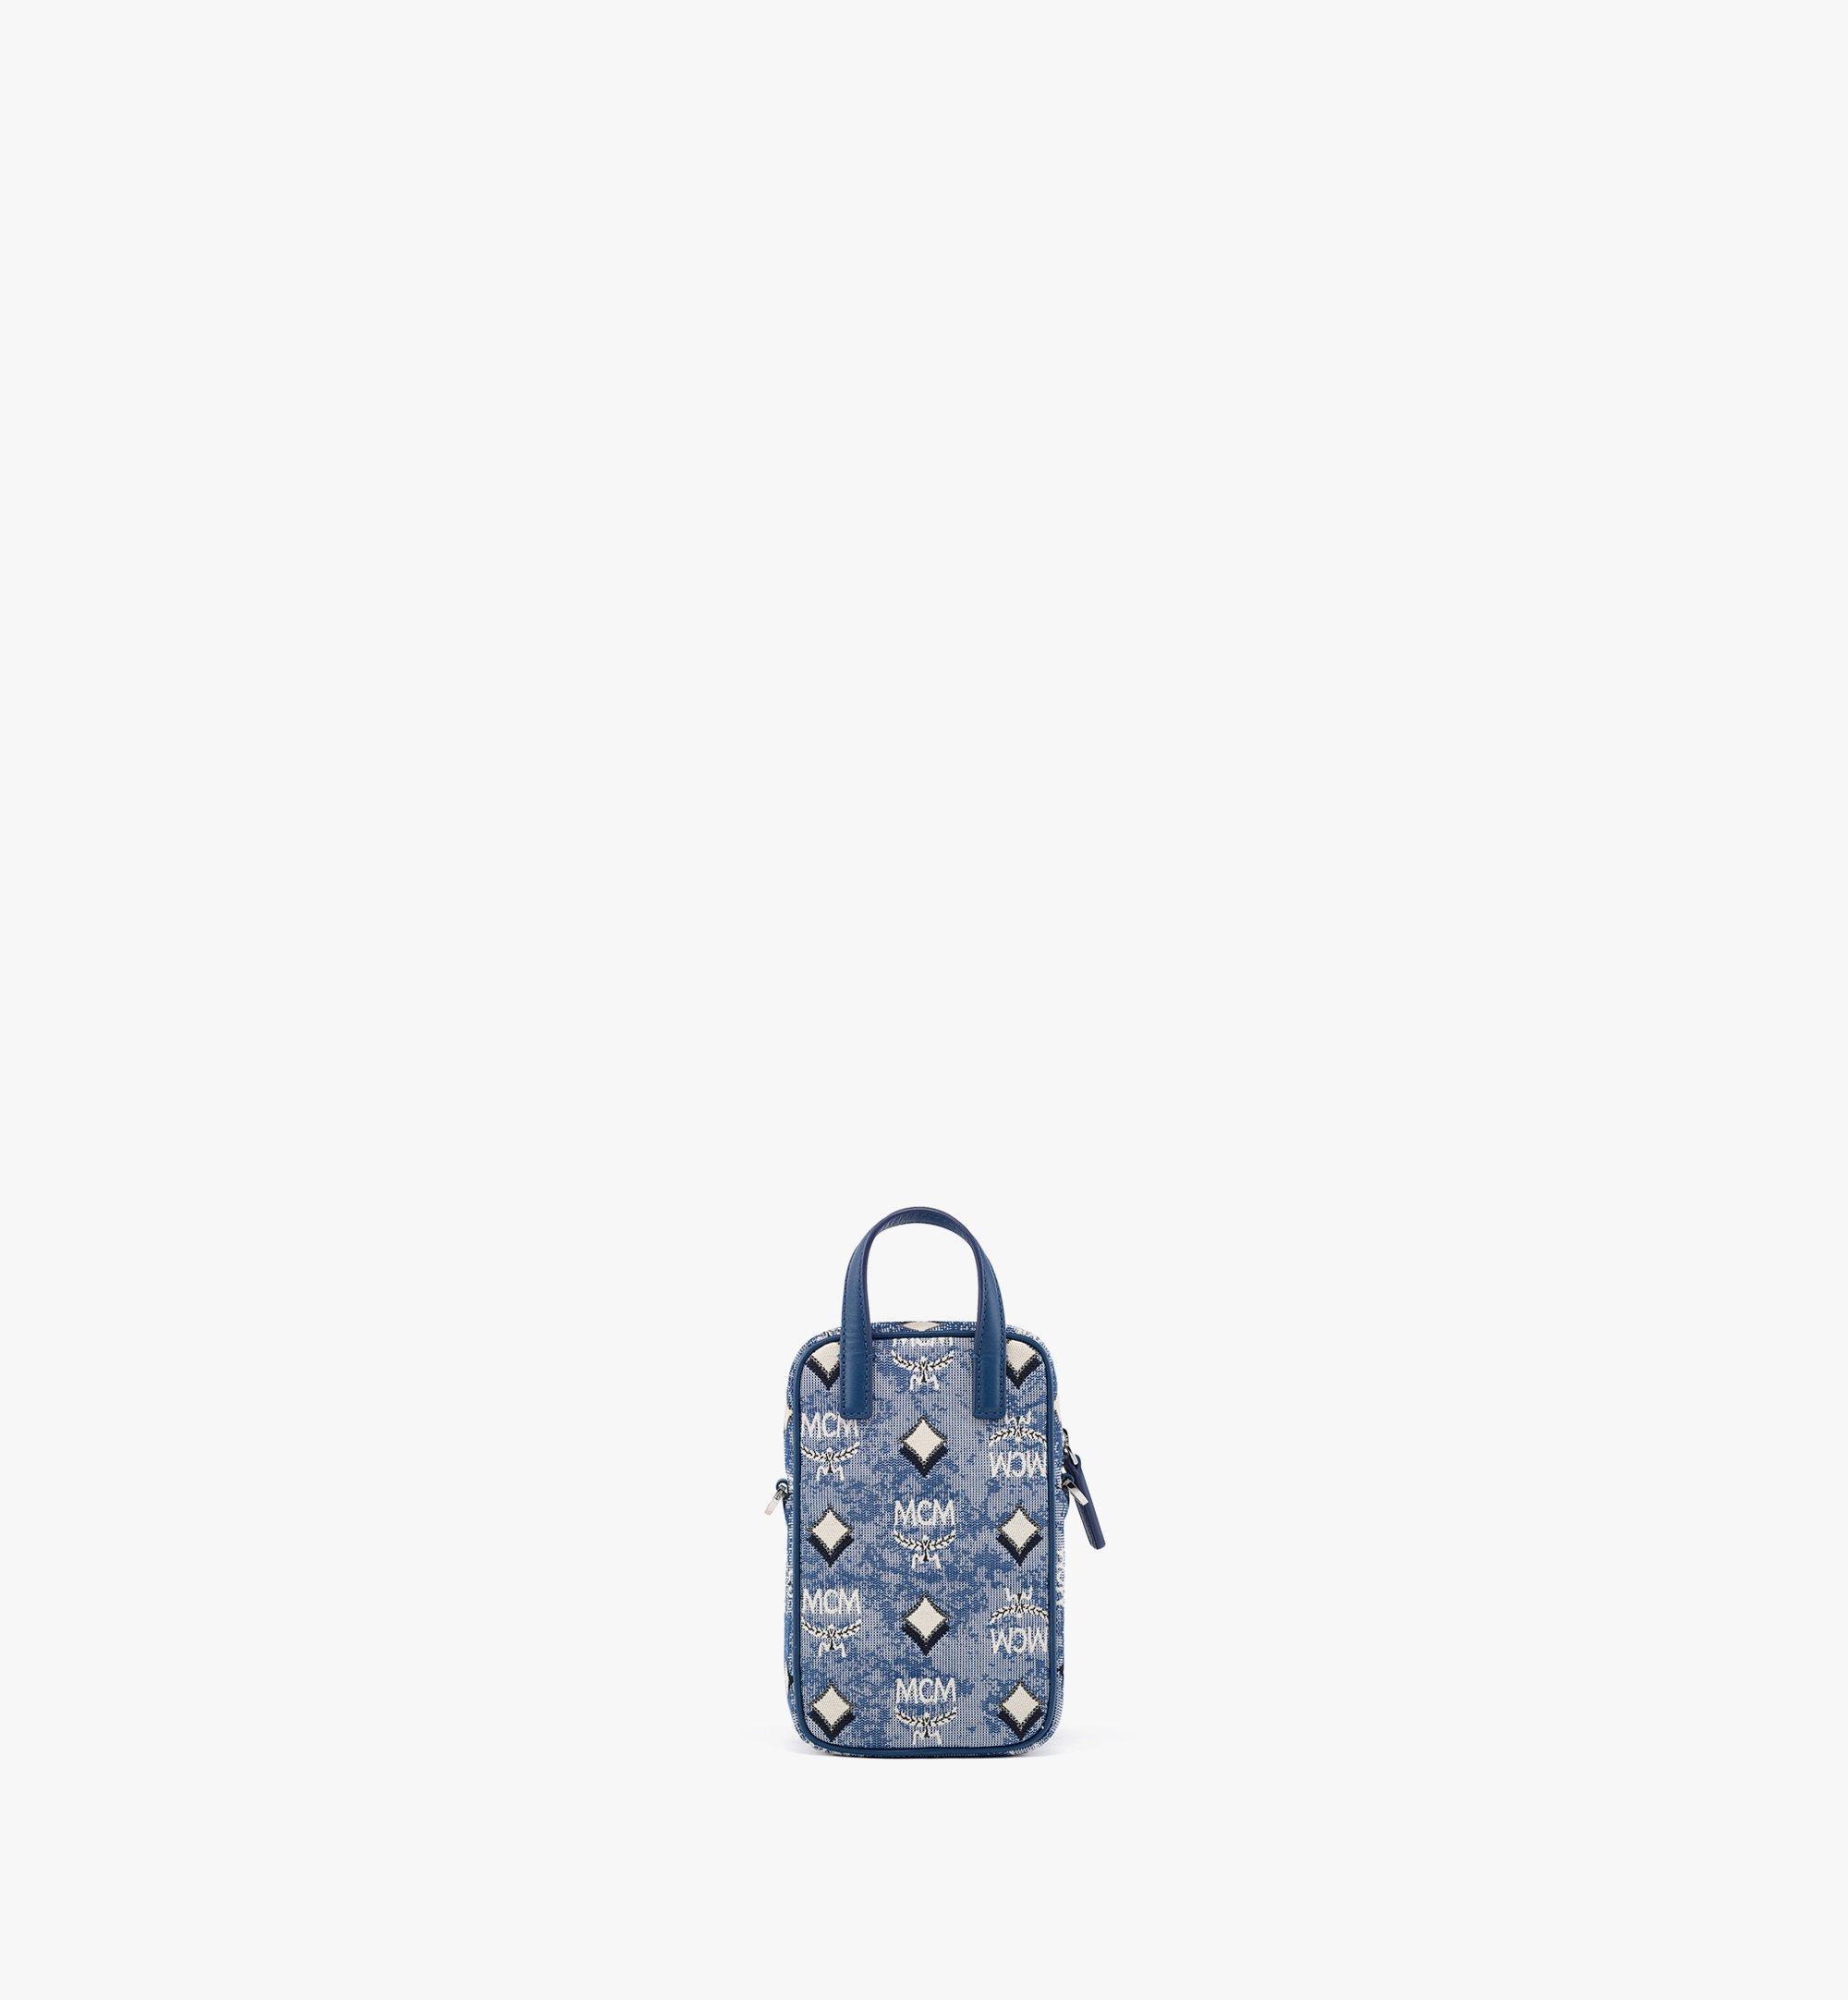 MCM N/S Crossbody Bag in Vintage Jacquard Monogram Blue MMRBATQ02LU001 Alternate View 3